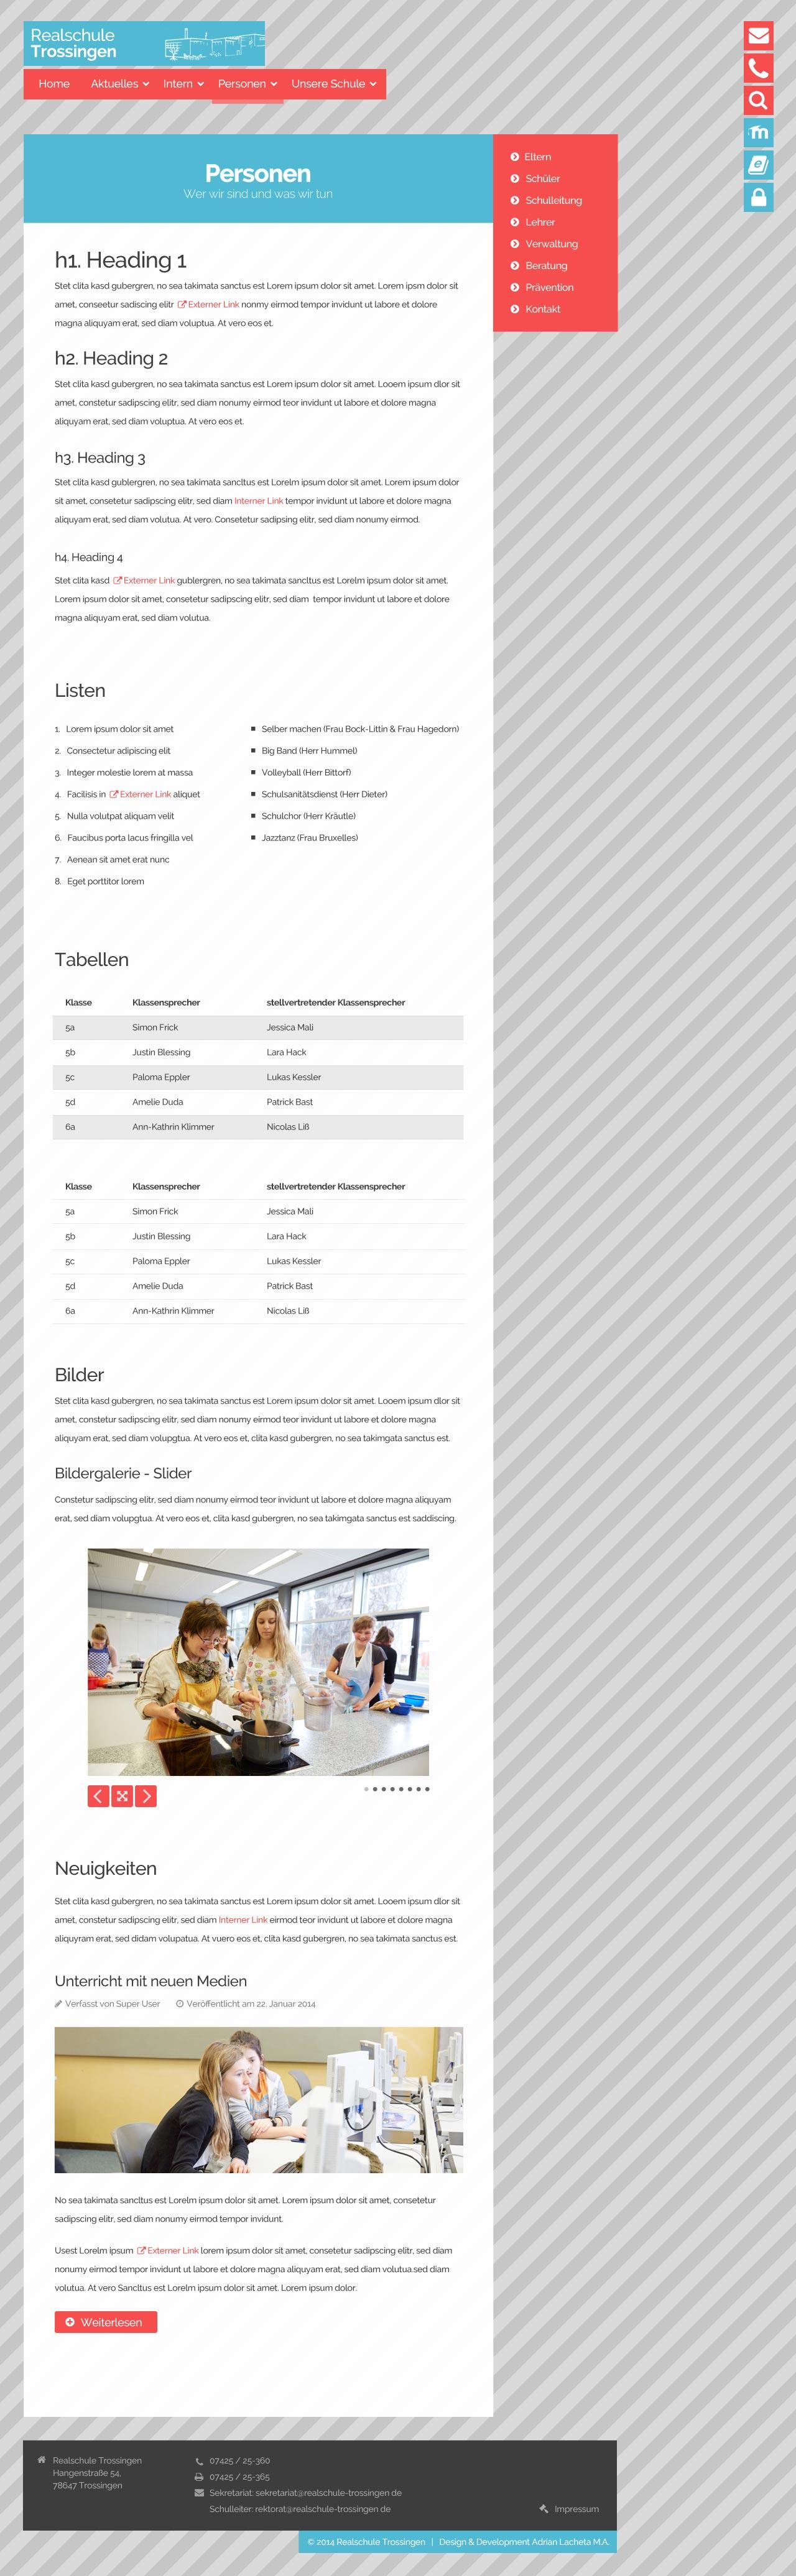 Adrian Lacheta Mediadesign - Website Realschule Trossingen